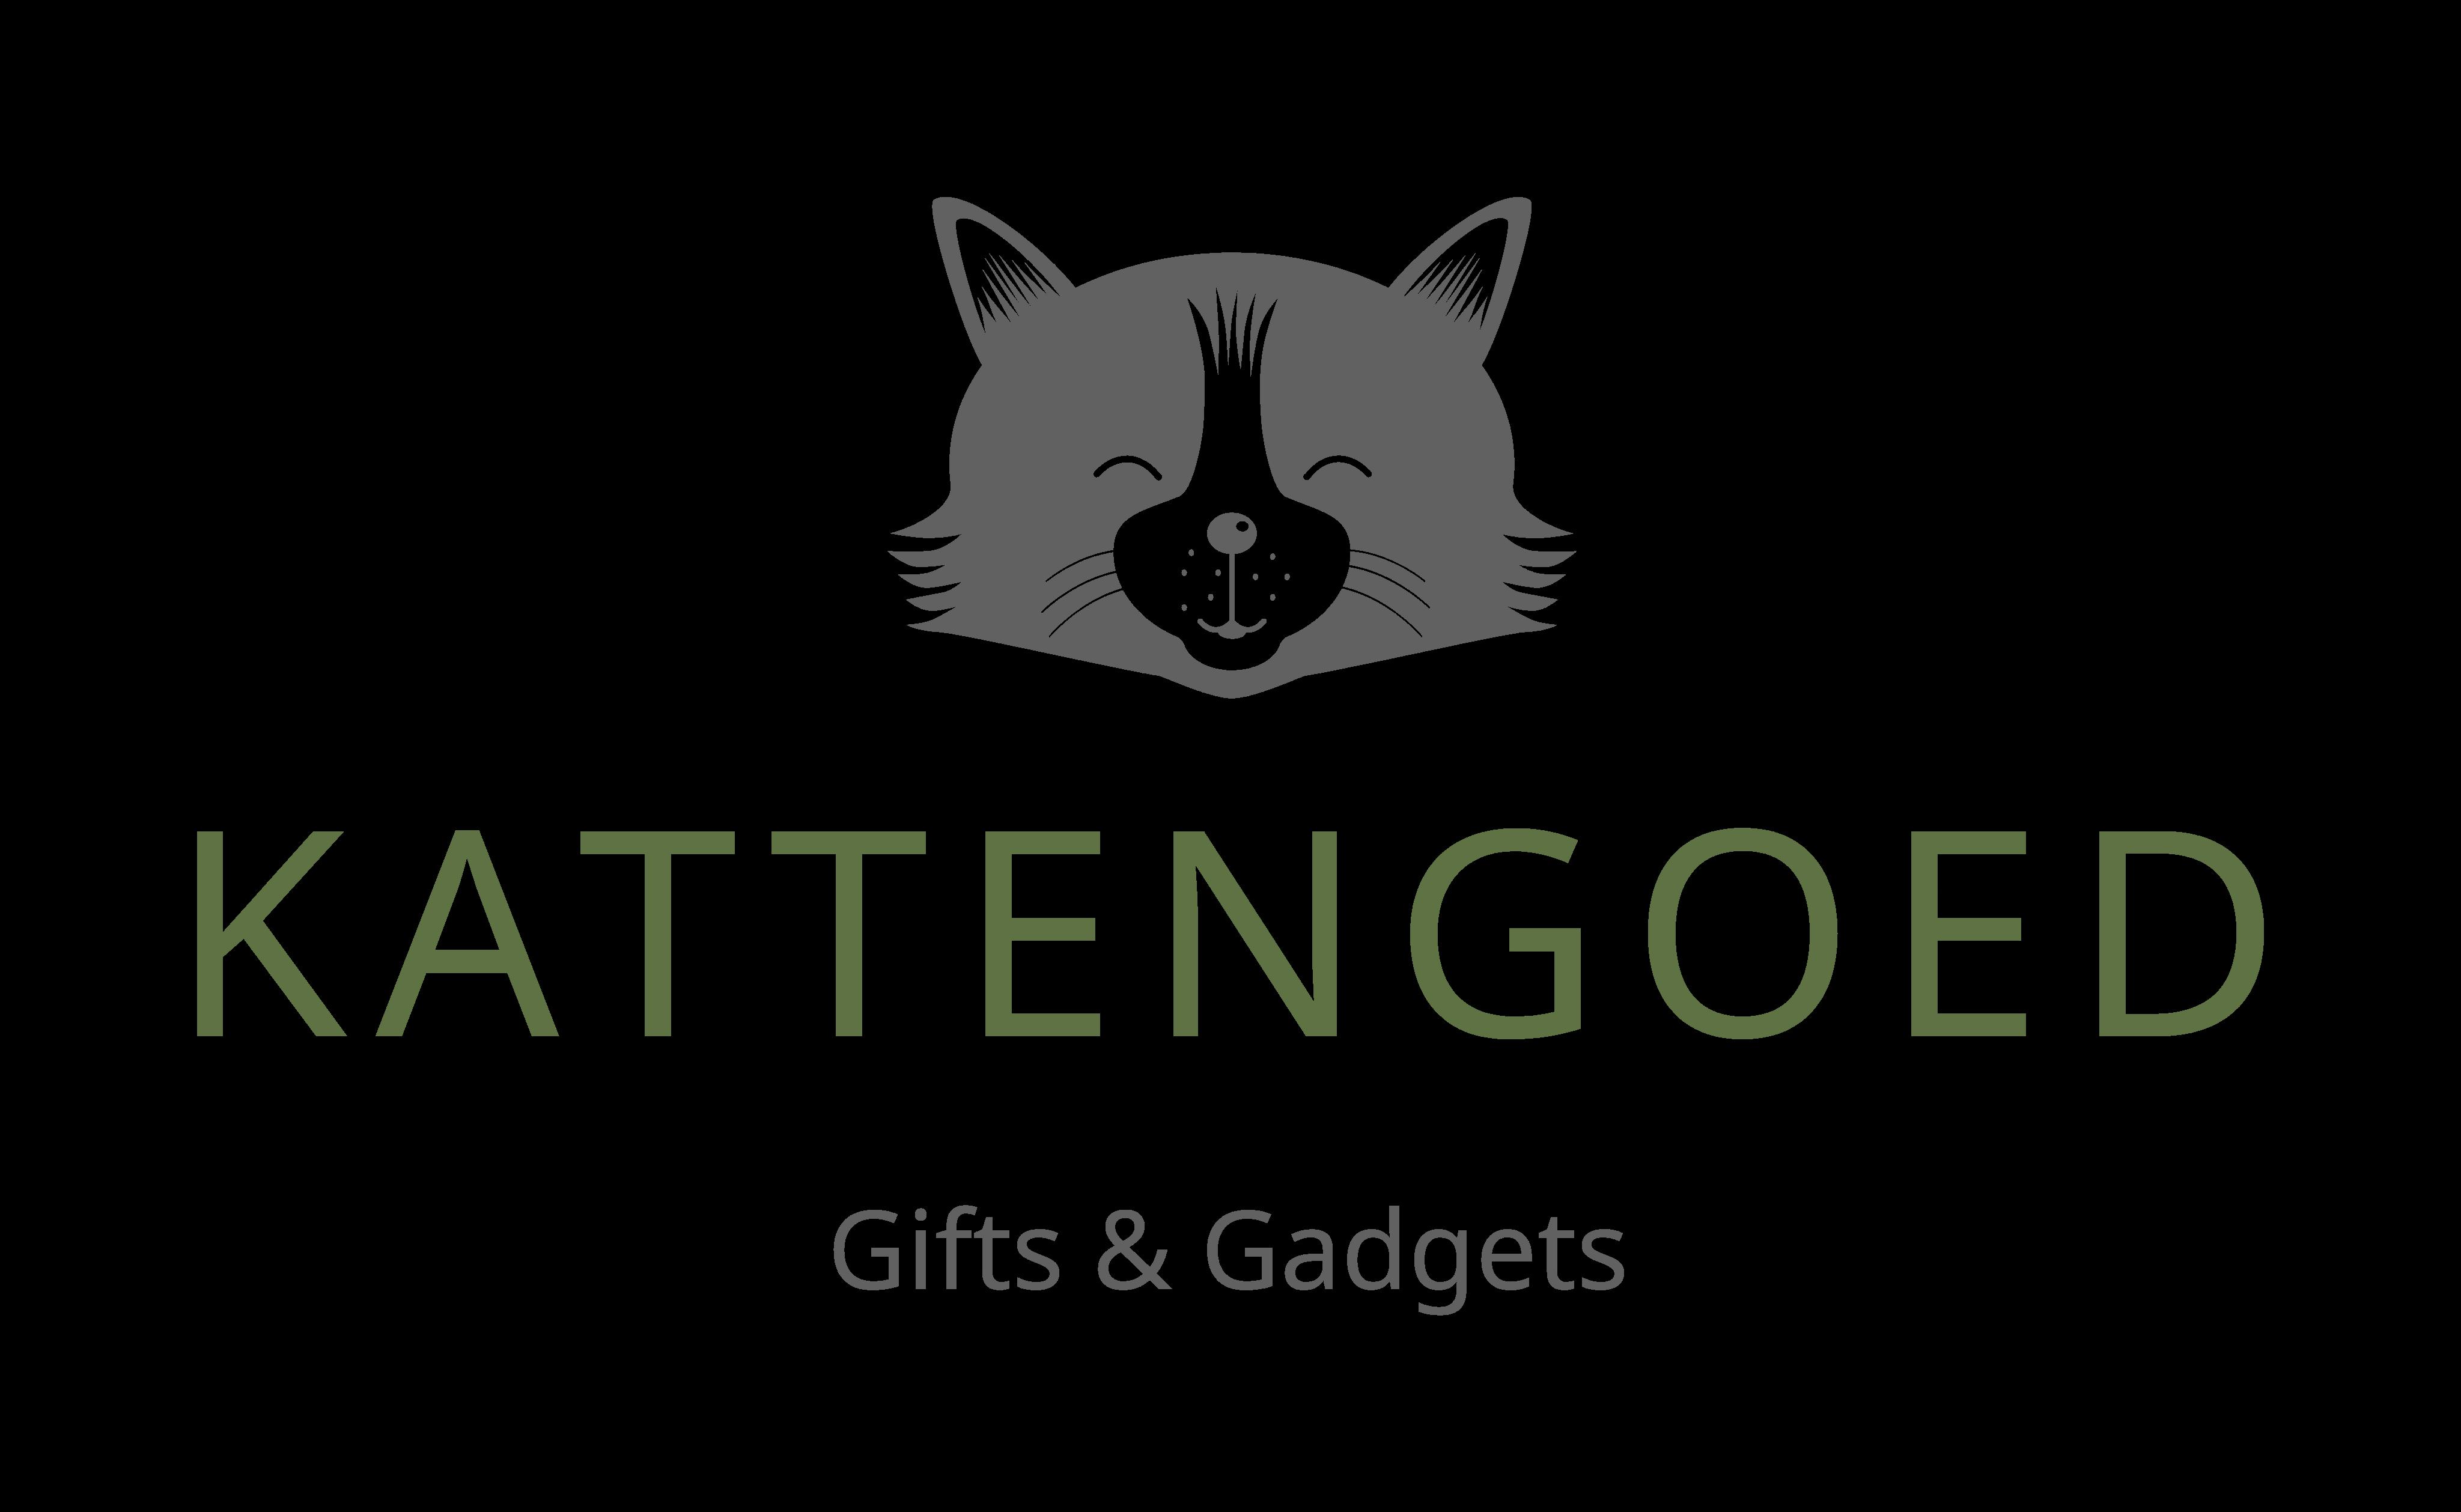 Kattengoed Gifts& Gadgets